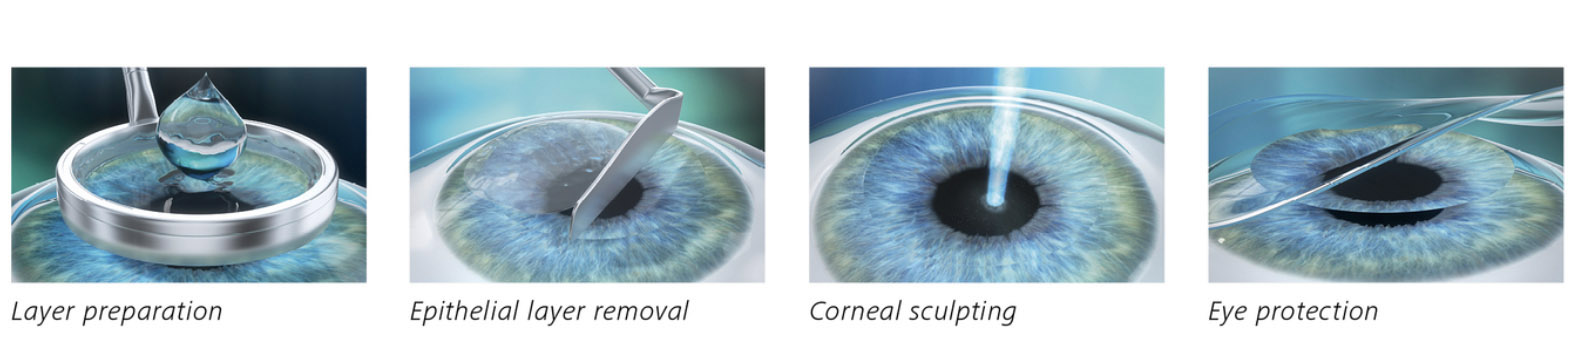 Laser Eye Surgery Procedures Eye Amp Laser Centre